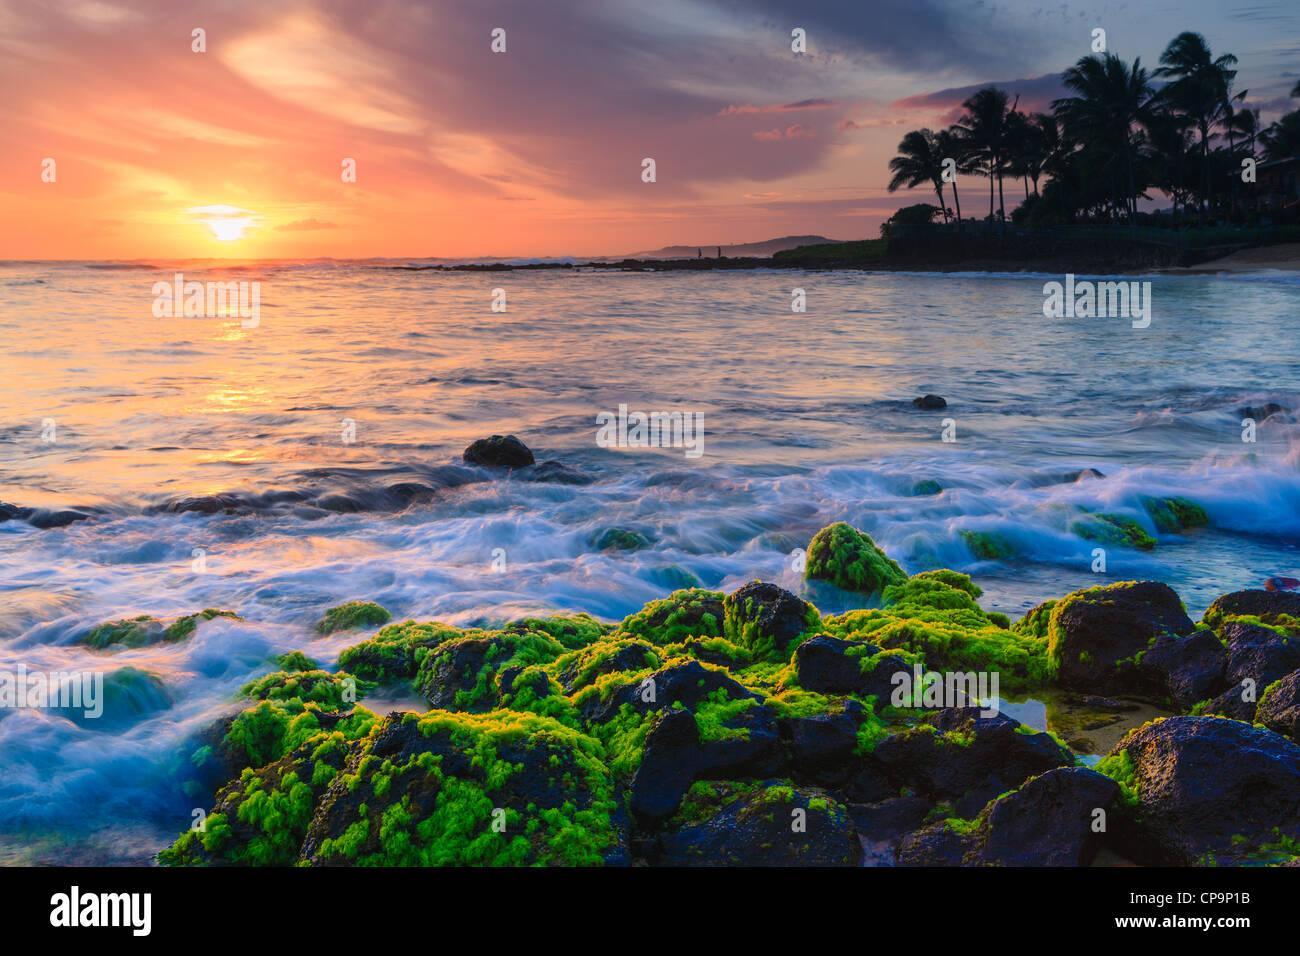 Sunset at famous Poipu Beach, Kauai, Hawaii - Stock Image